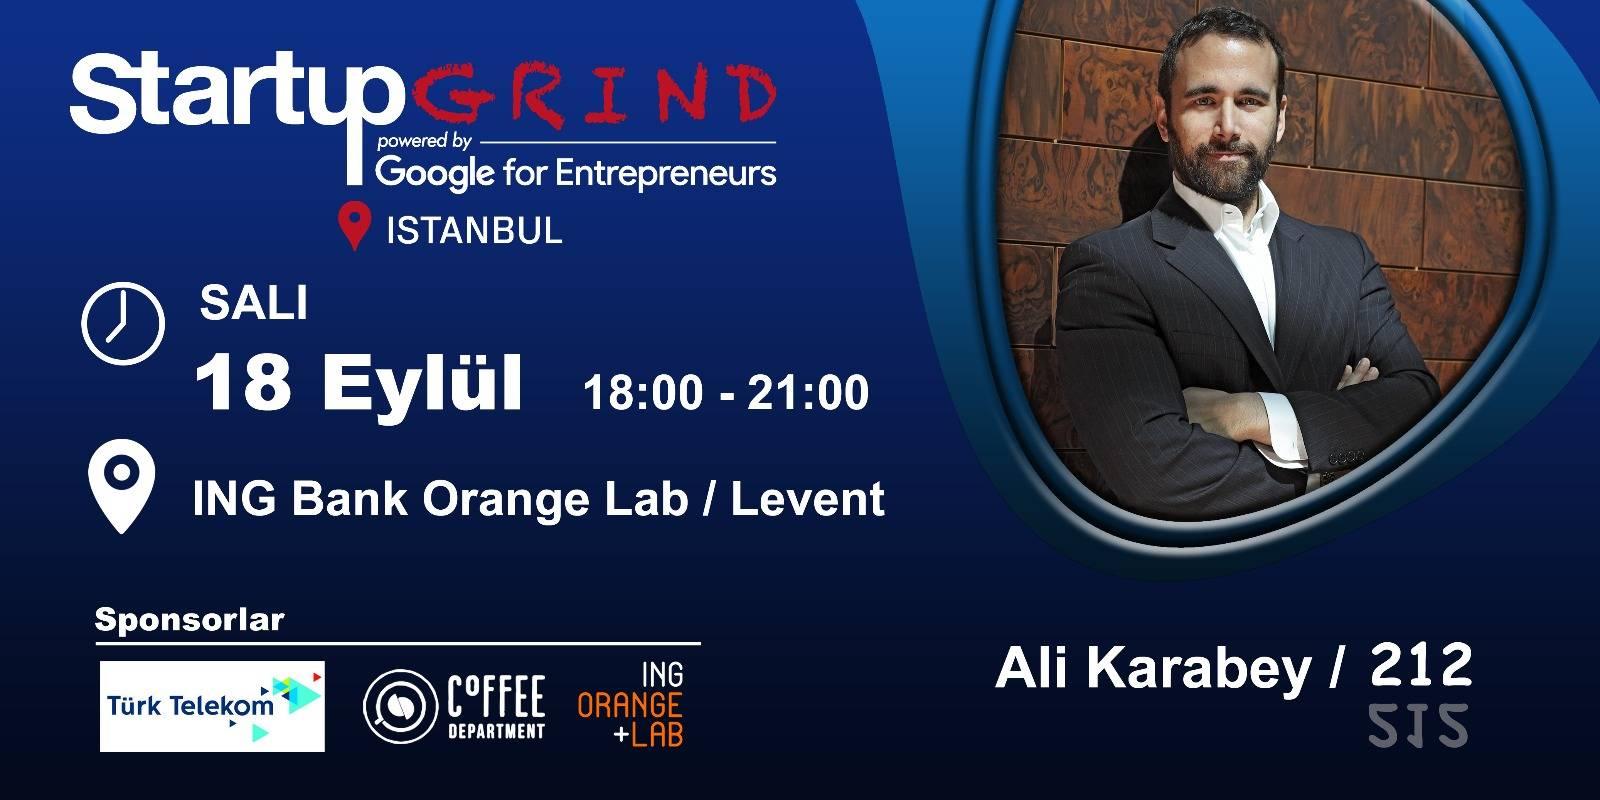 Startup Grind İstanbul Chapter, Yeni Sezon Etkinliklerine